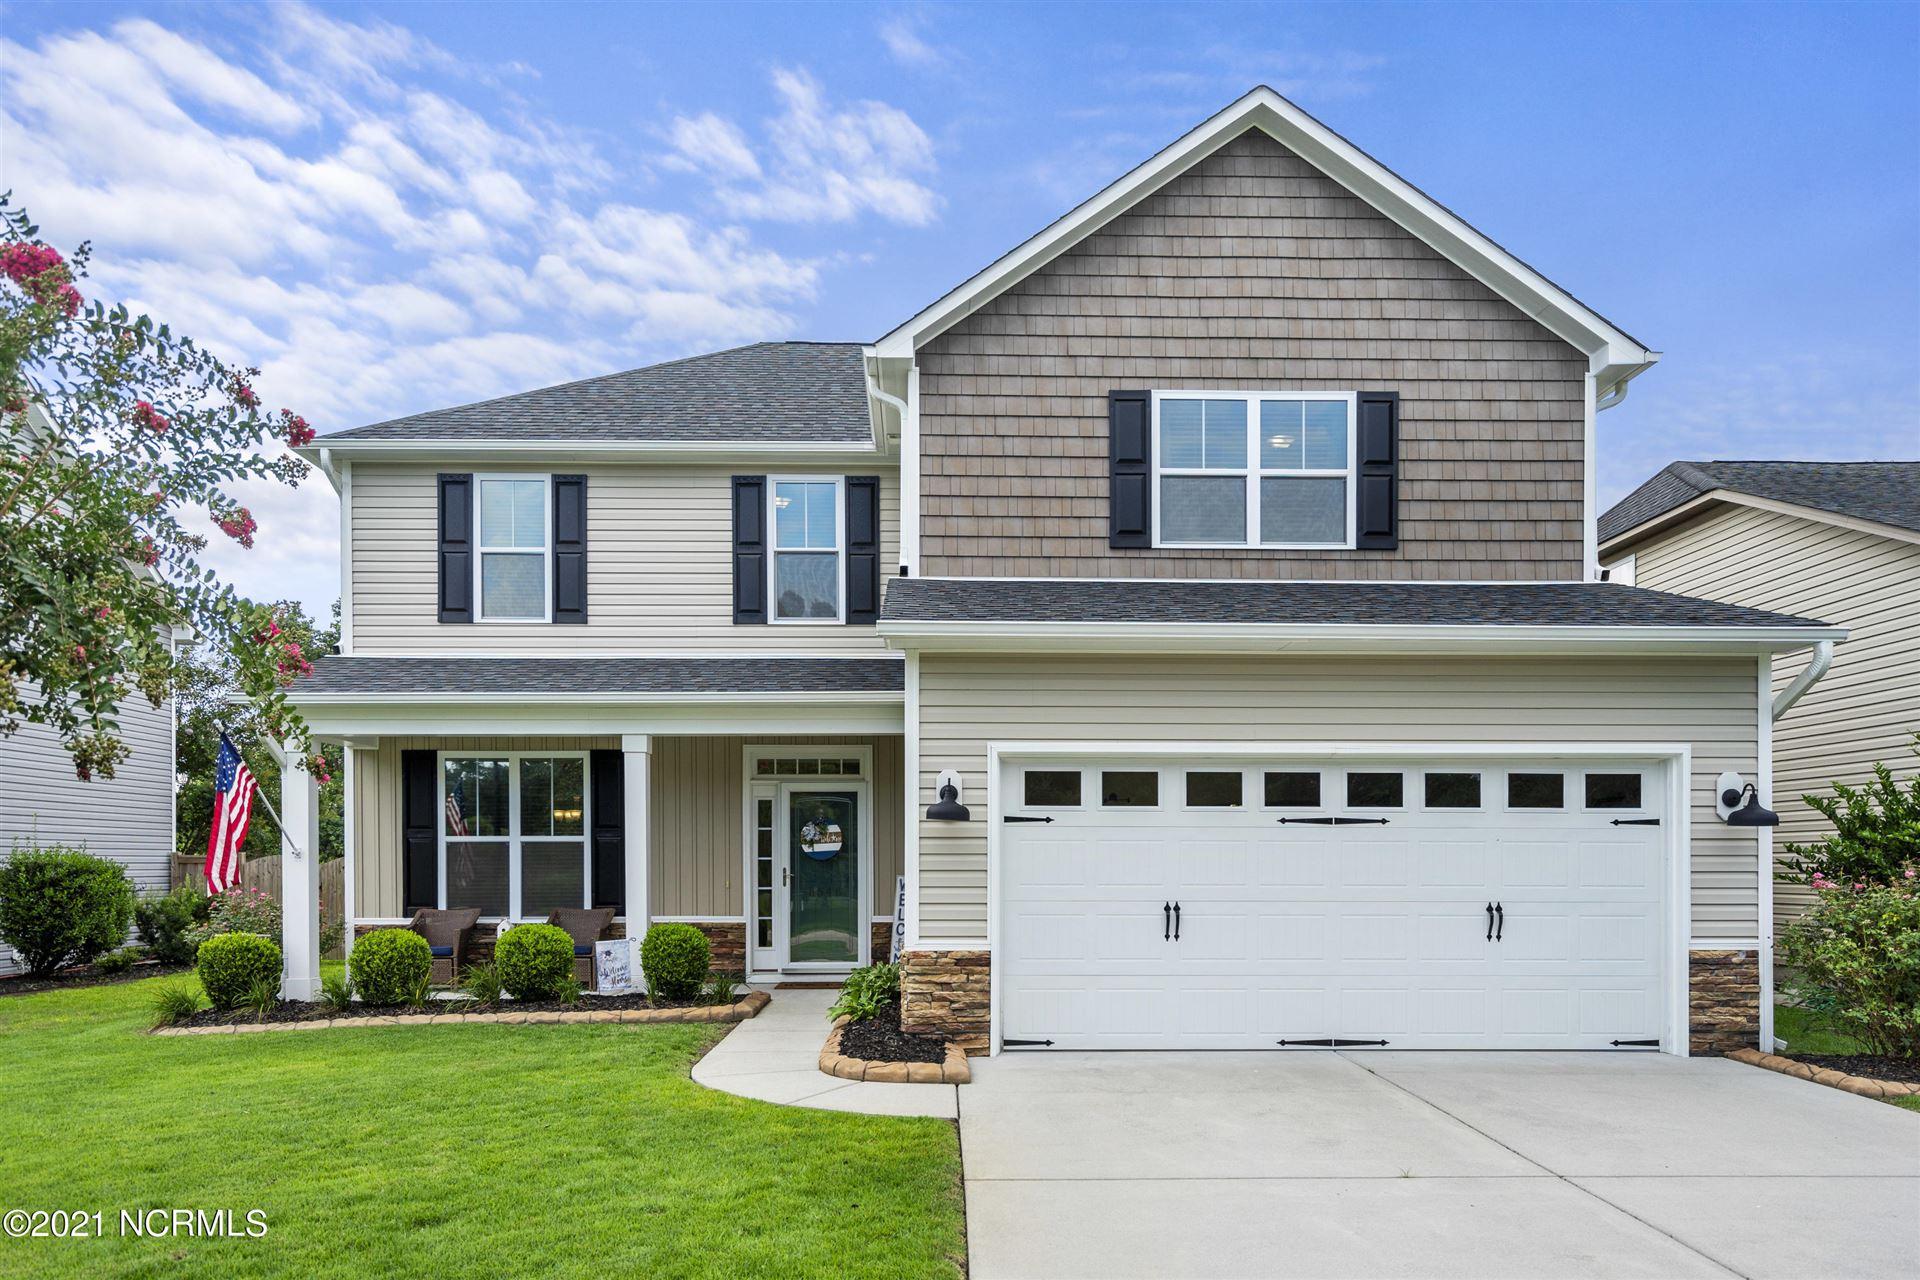 Photo for 8546 Jadewood Drive, Wilmington, NC 28411 (MLS # 100284886)